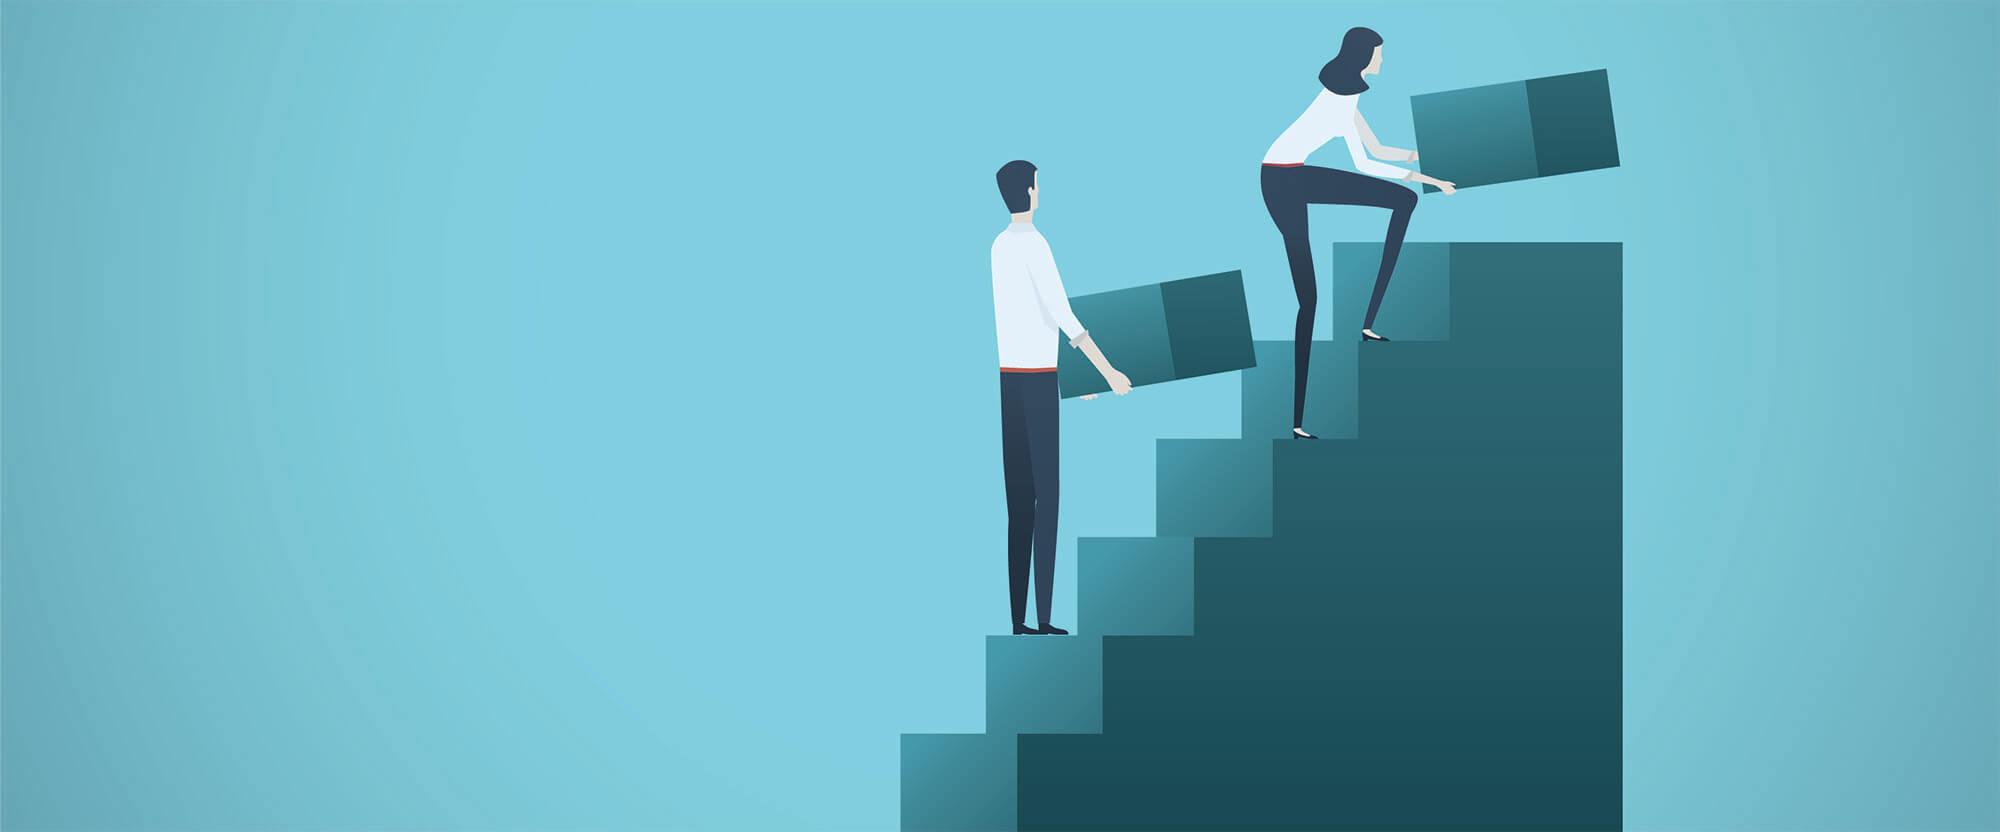 team work steps